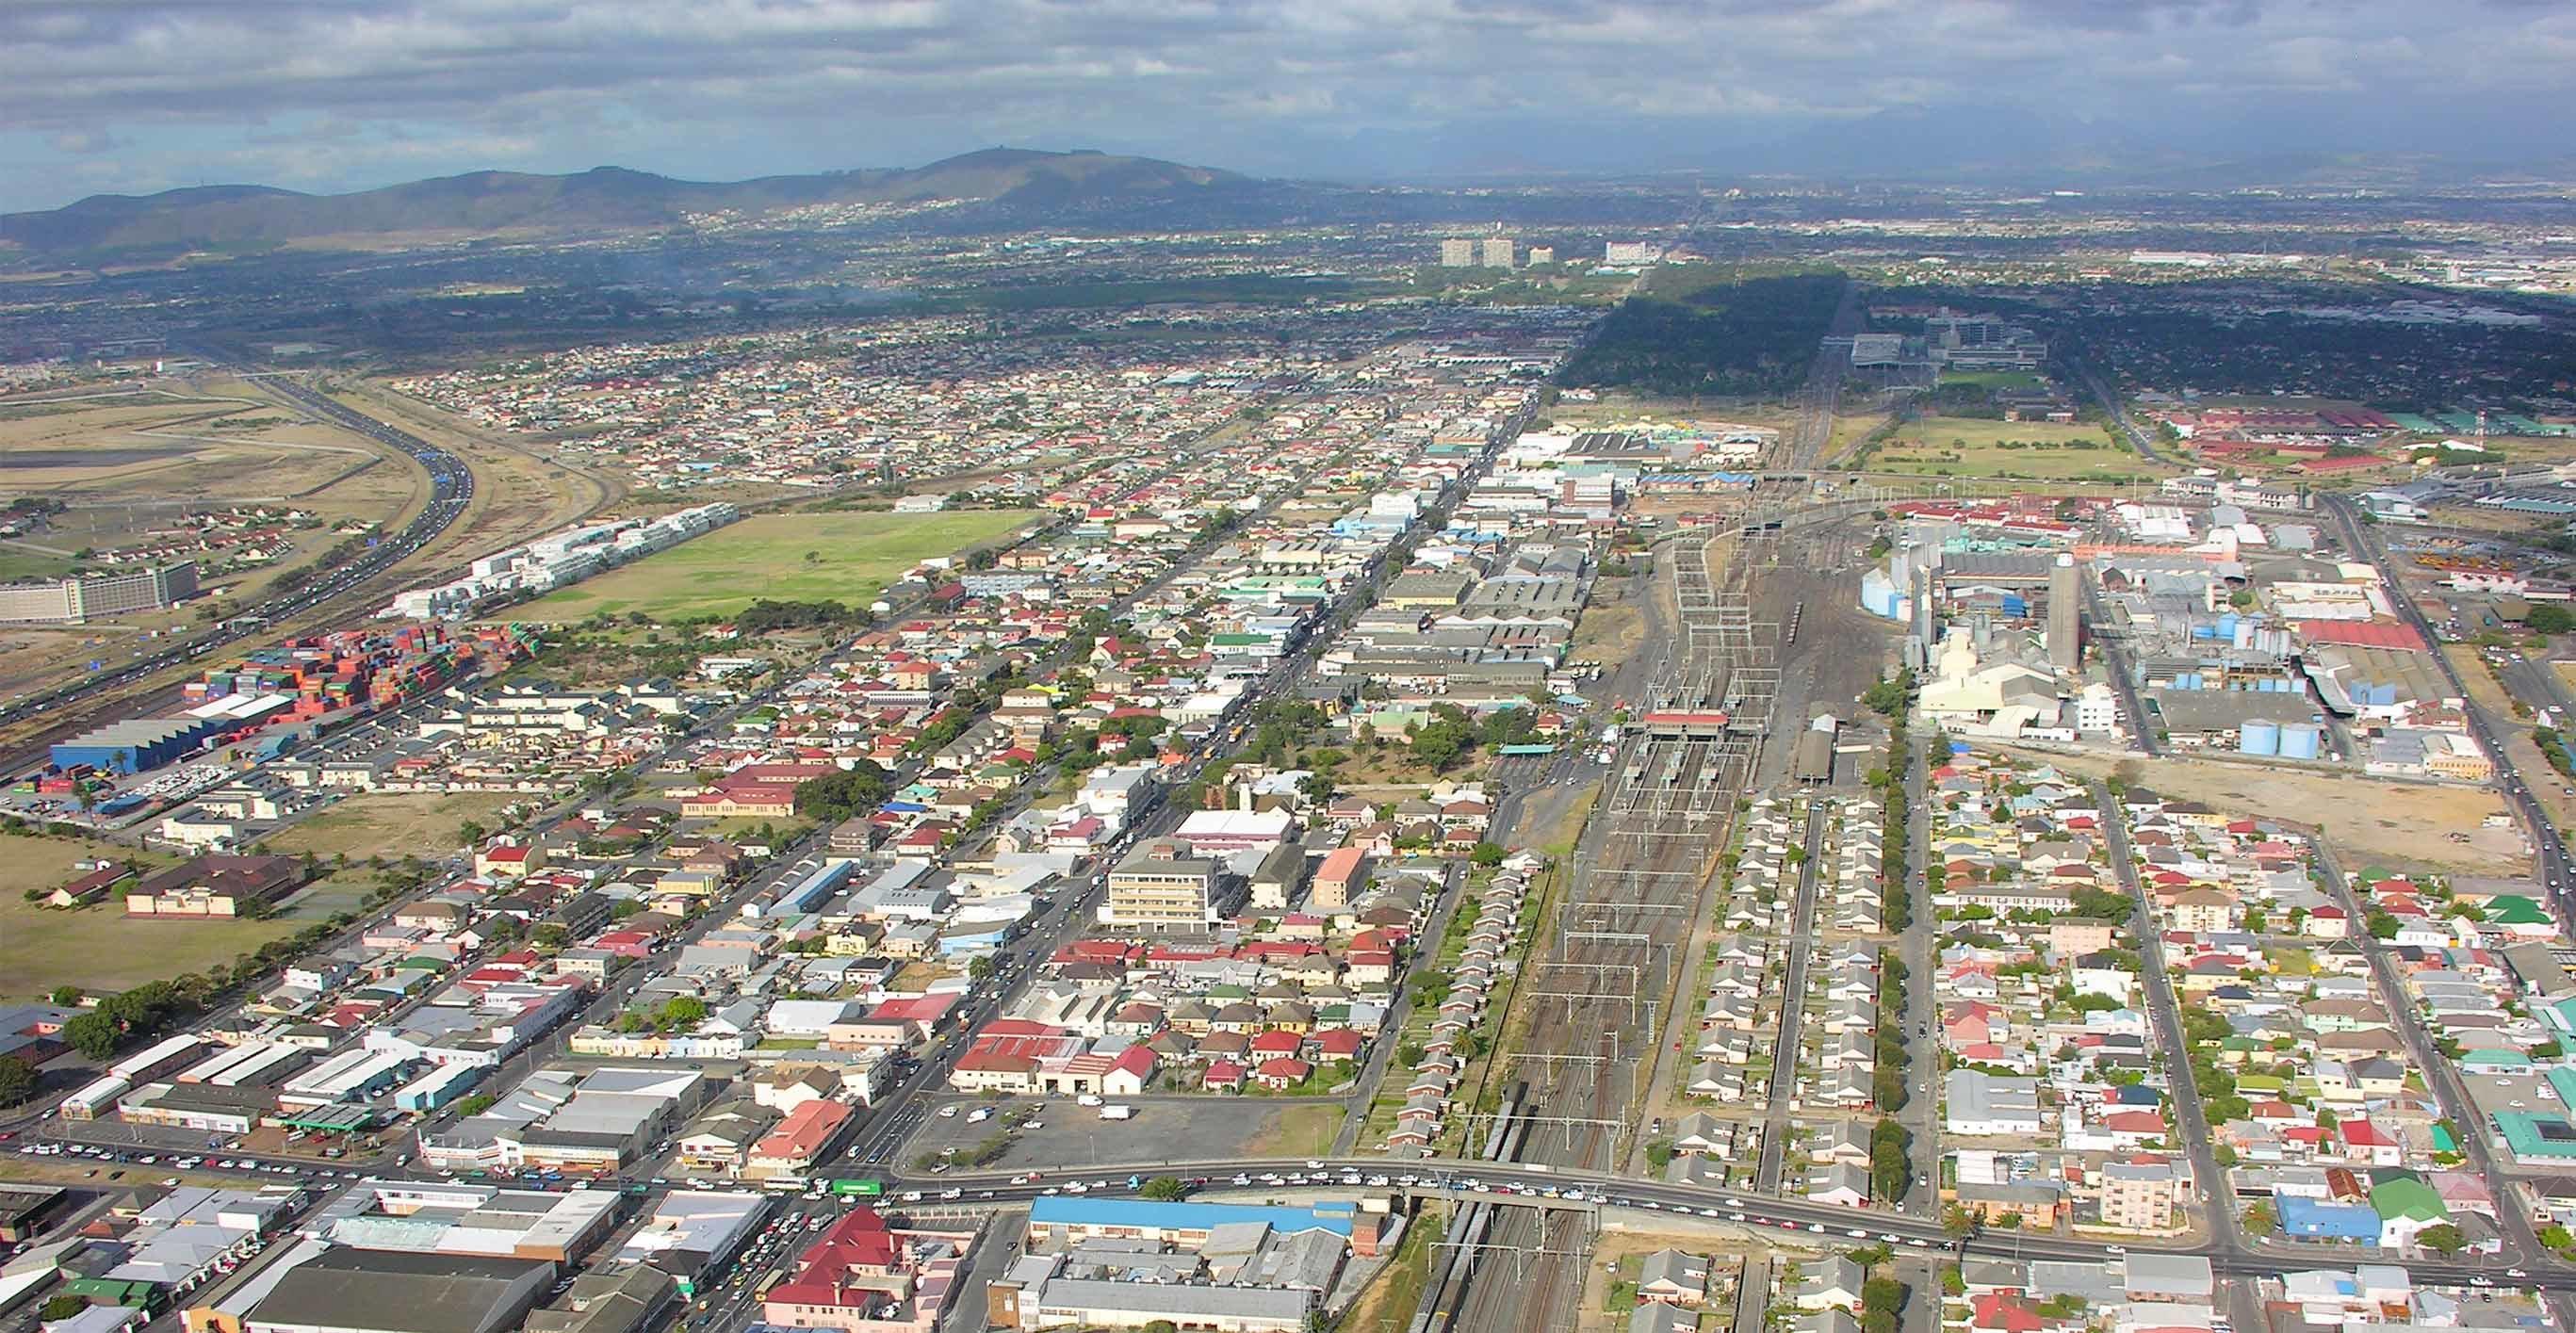 Bureau For Architecture And Urbanism : Cape town density syndicate bureau ali saad architecture urbanism